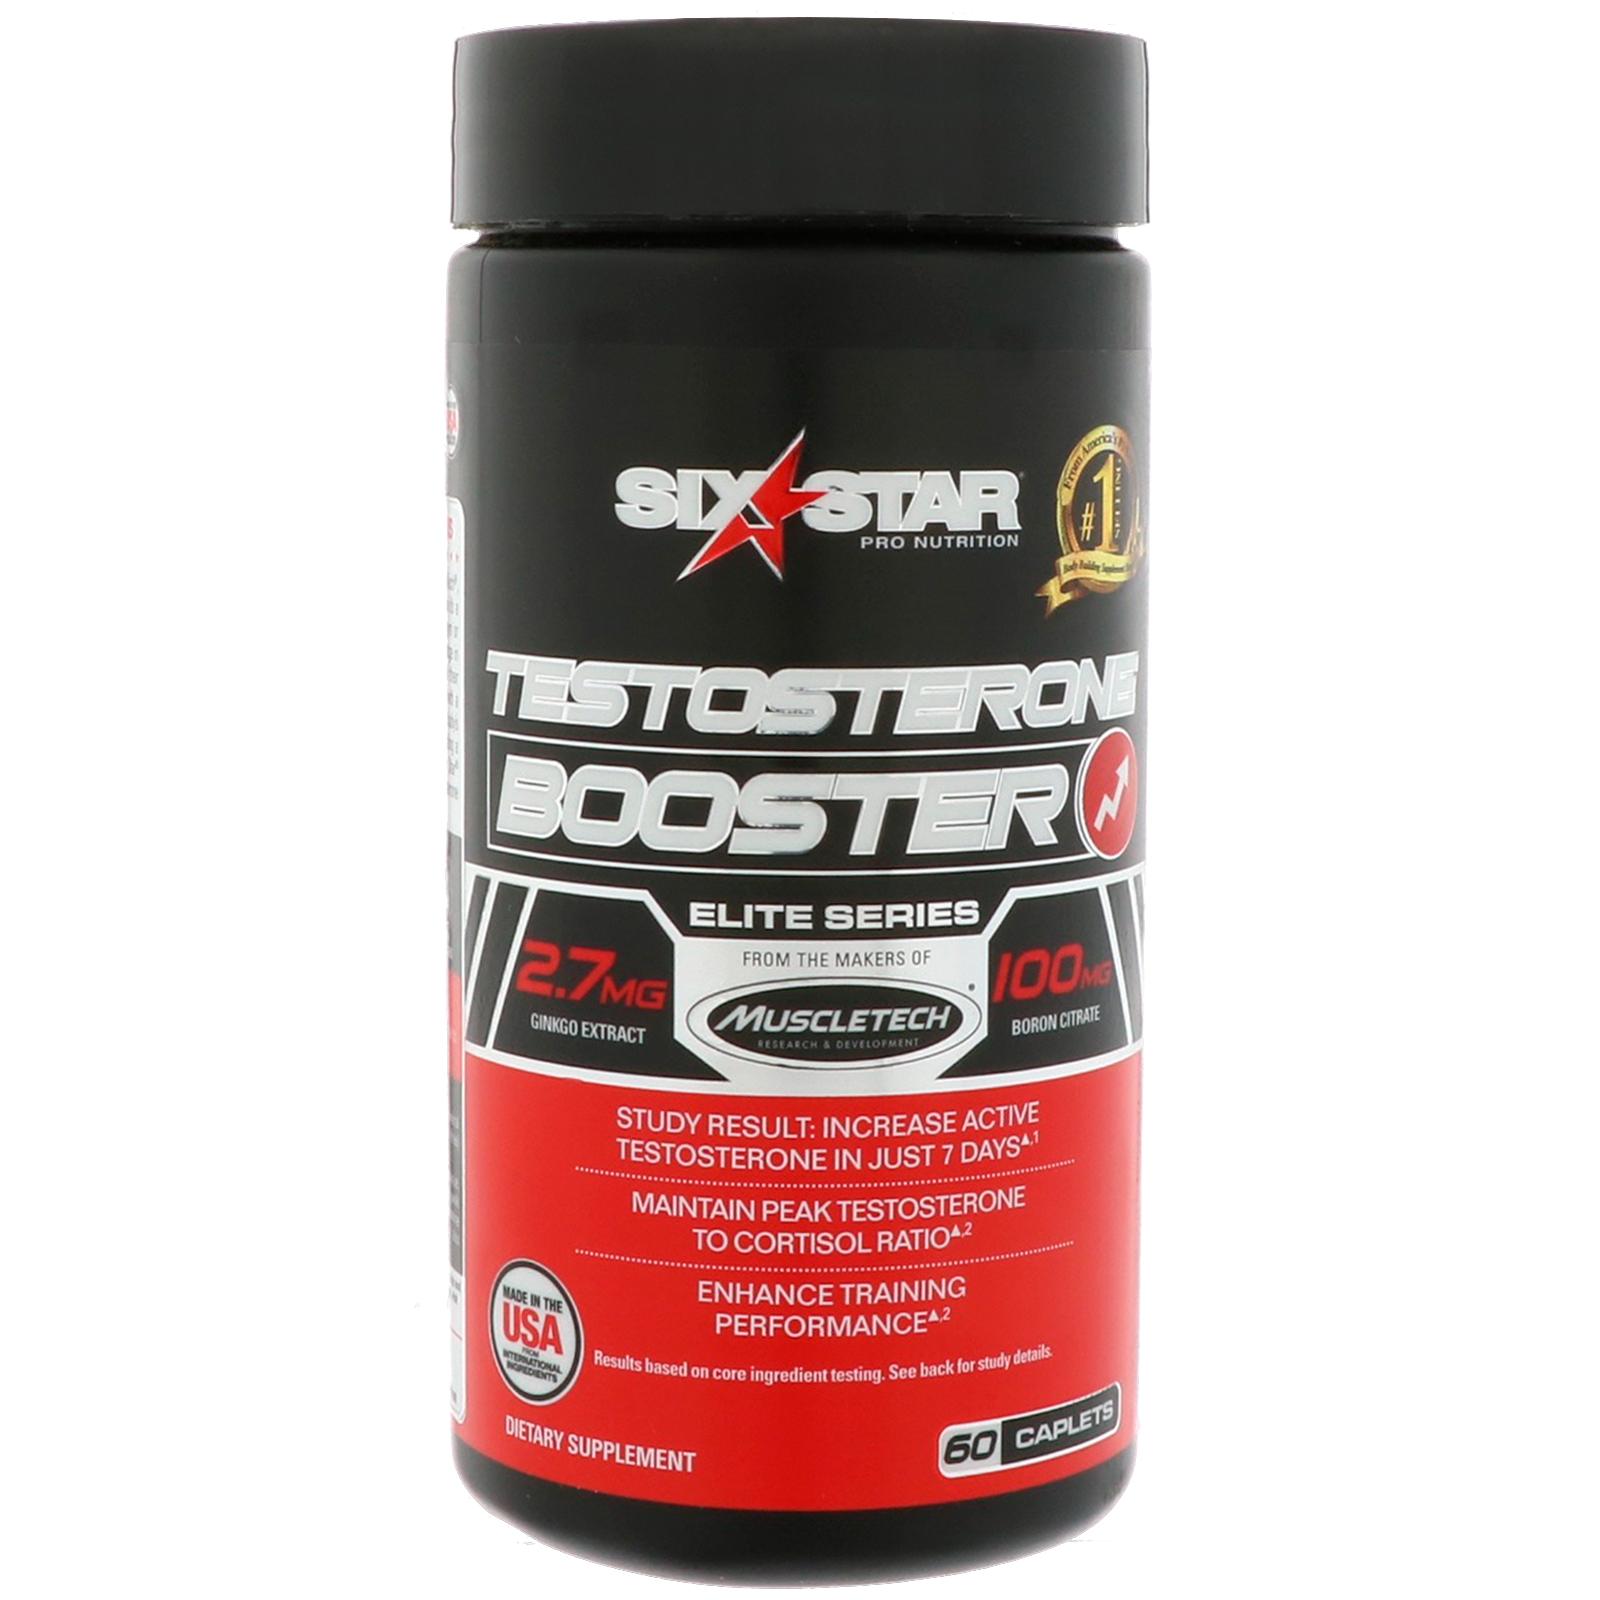 Testosterone booster 6 star